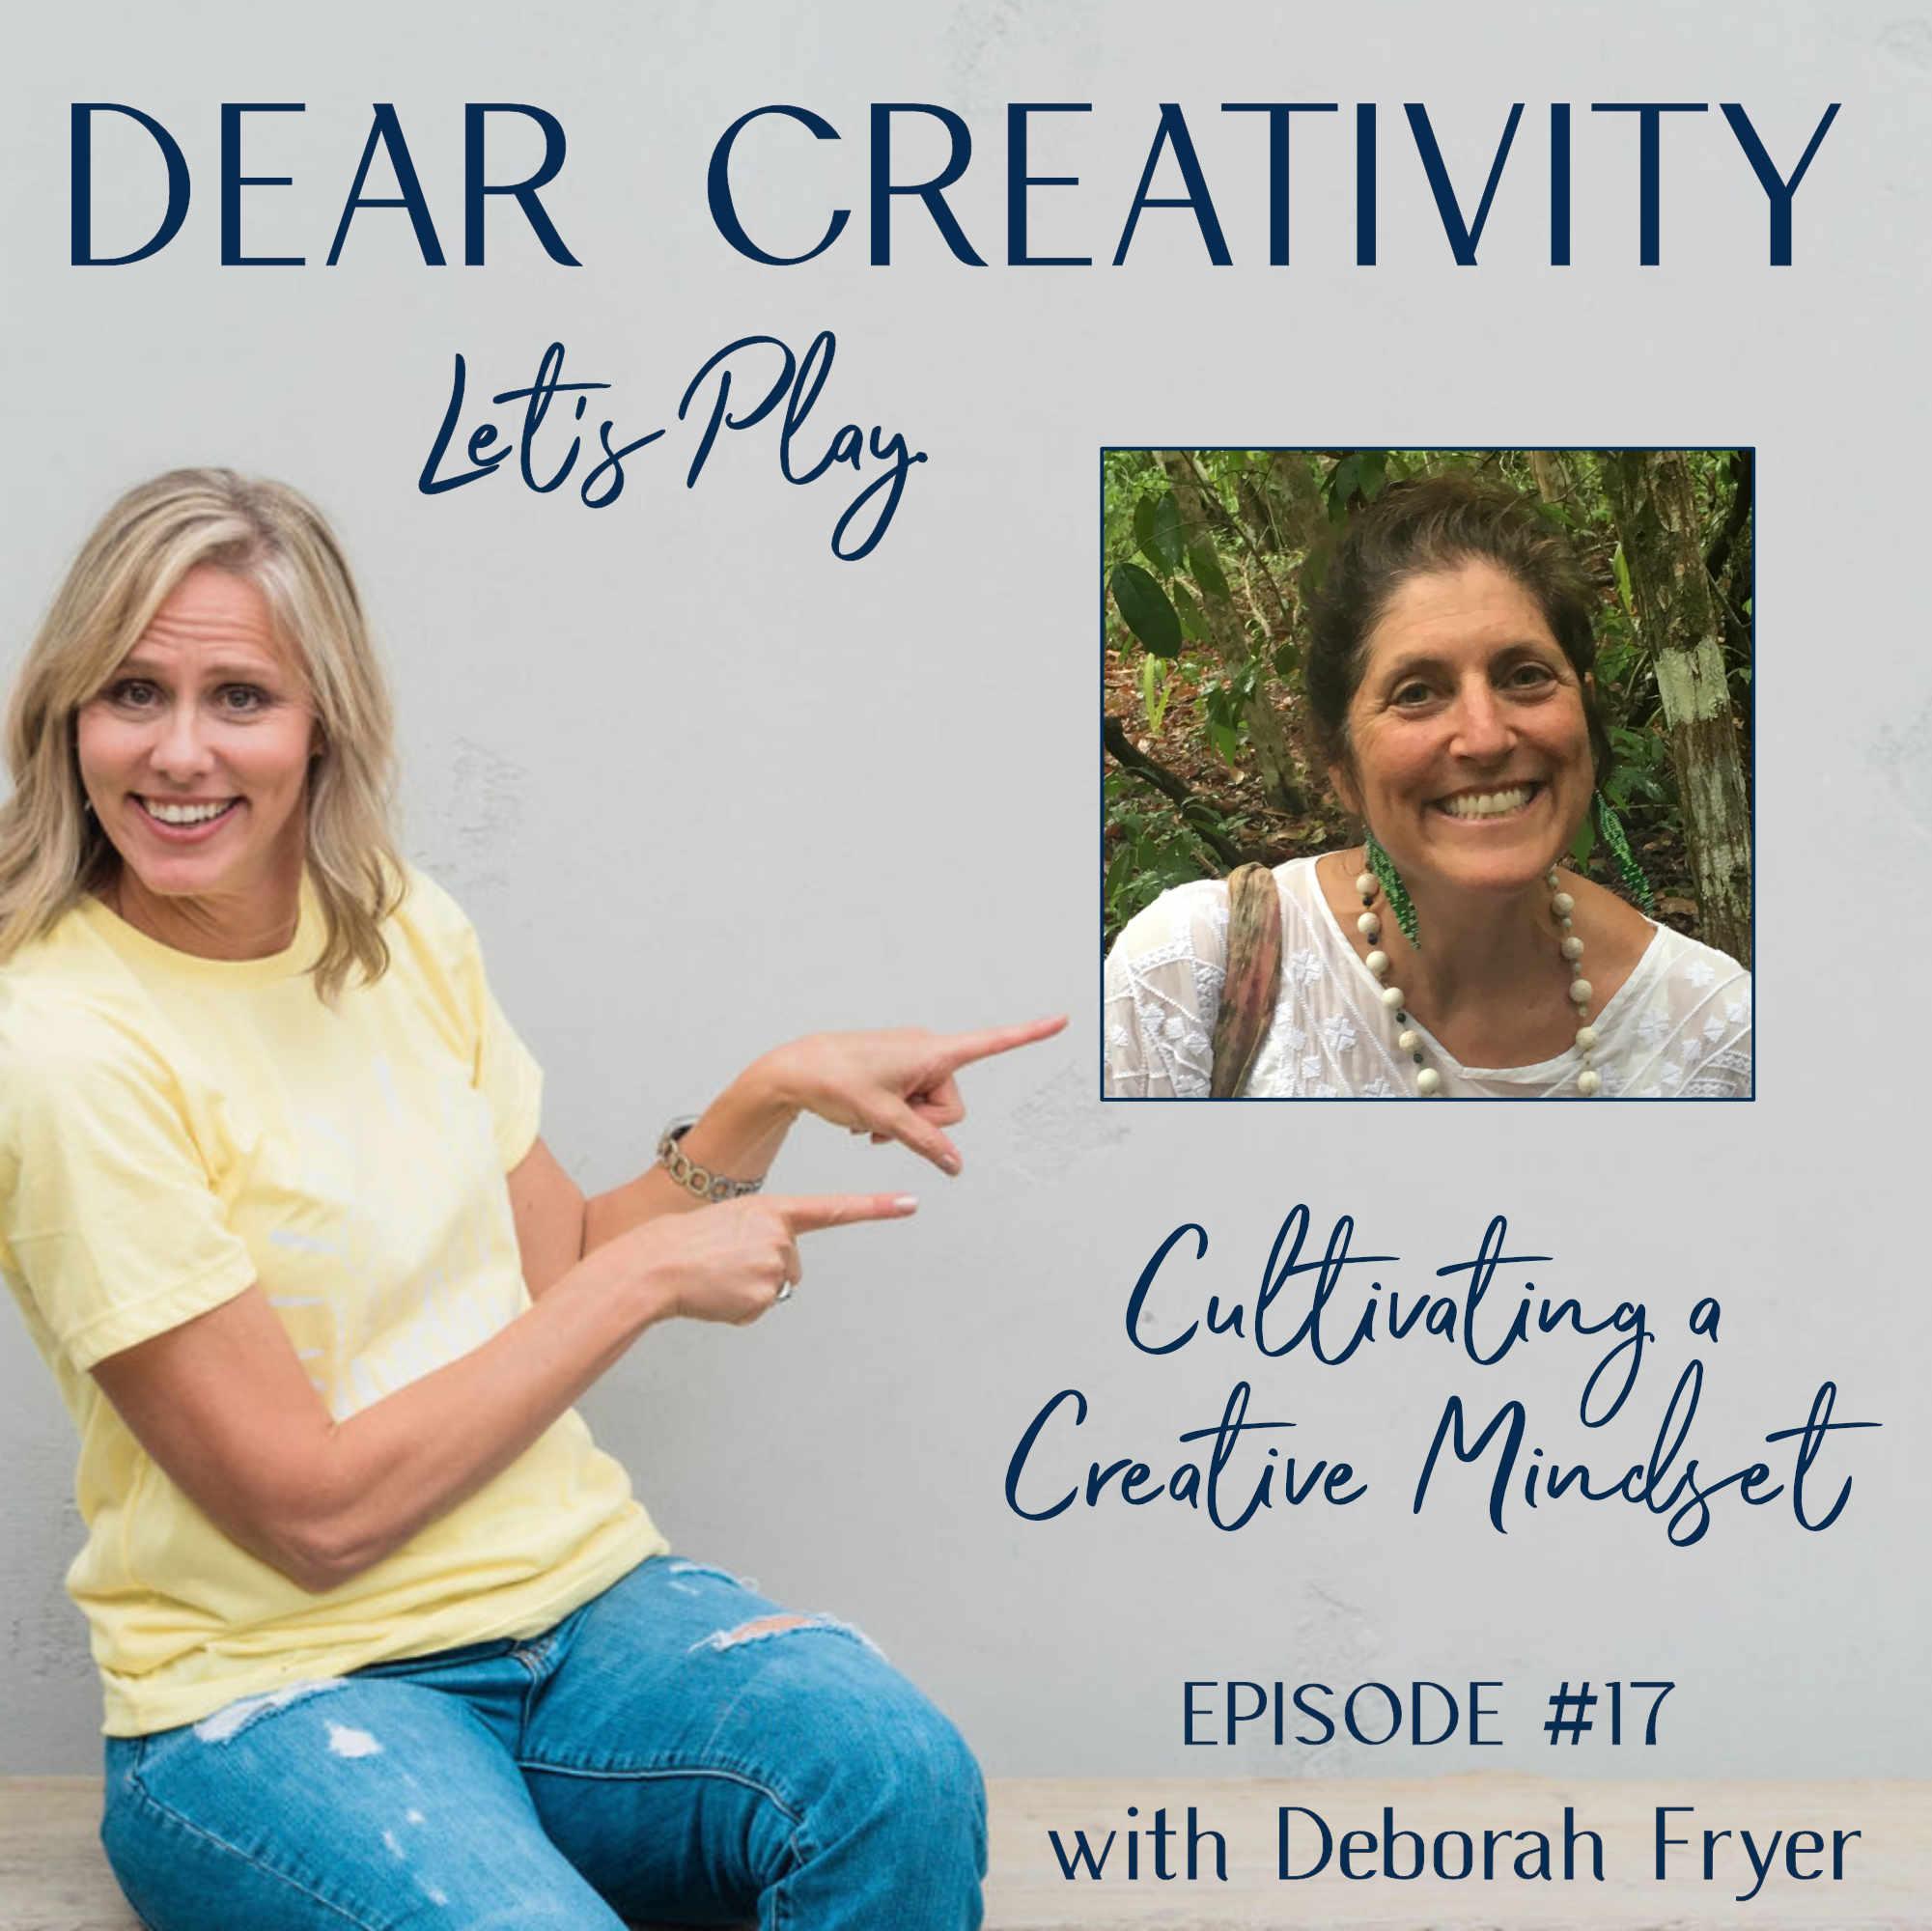 creative mindset episode graphic